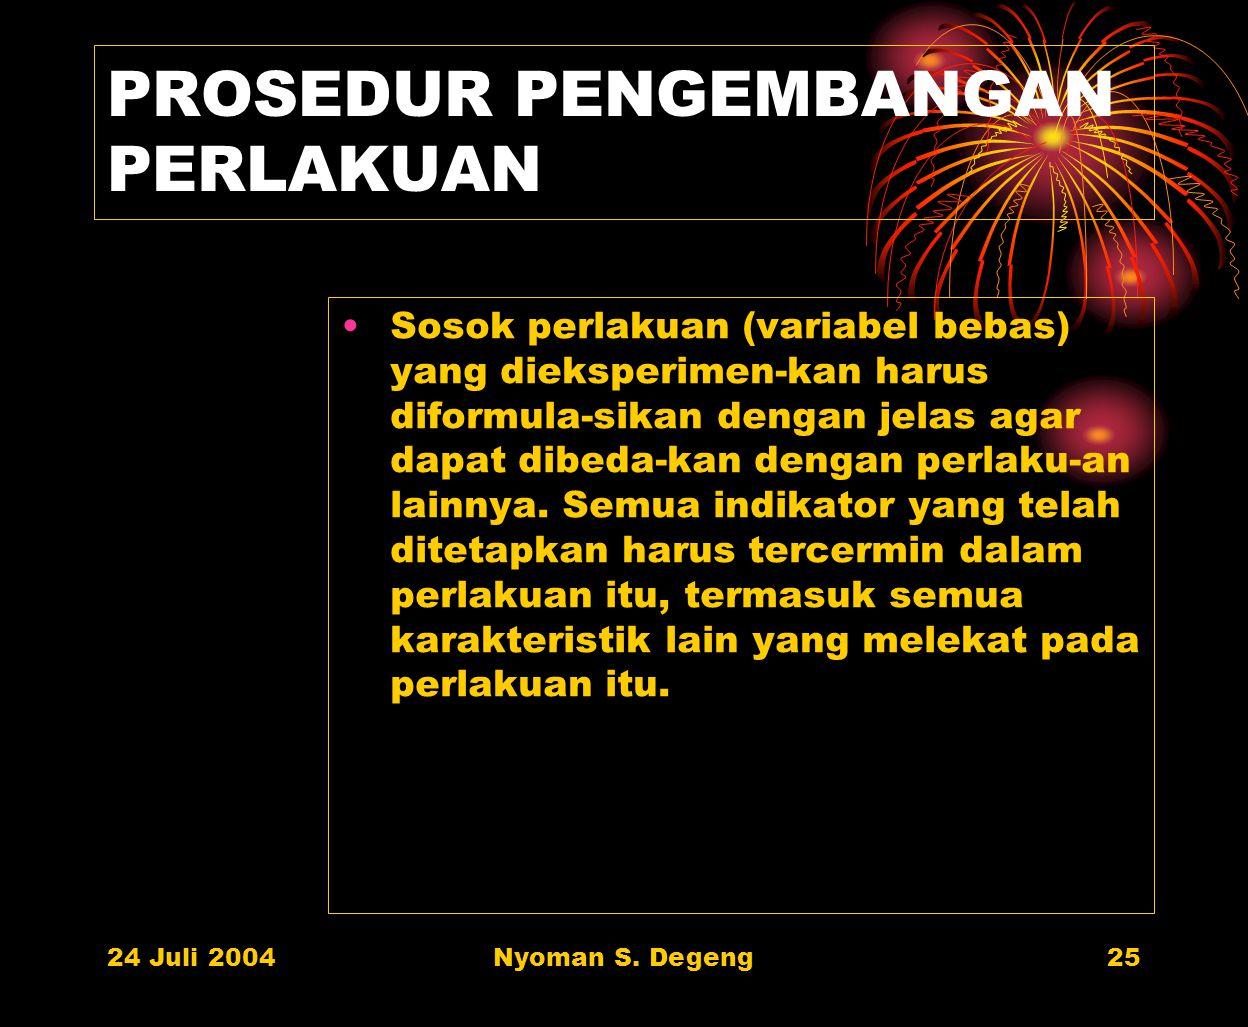 24 Juli 2004Nyoman S. Degeng24 PROSEDUR PENGEMBANGAN INSTRUMEN Proposal penelitian perlu dilengkapi dengan paparan mengenai bagaimana instrumen peneli